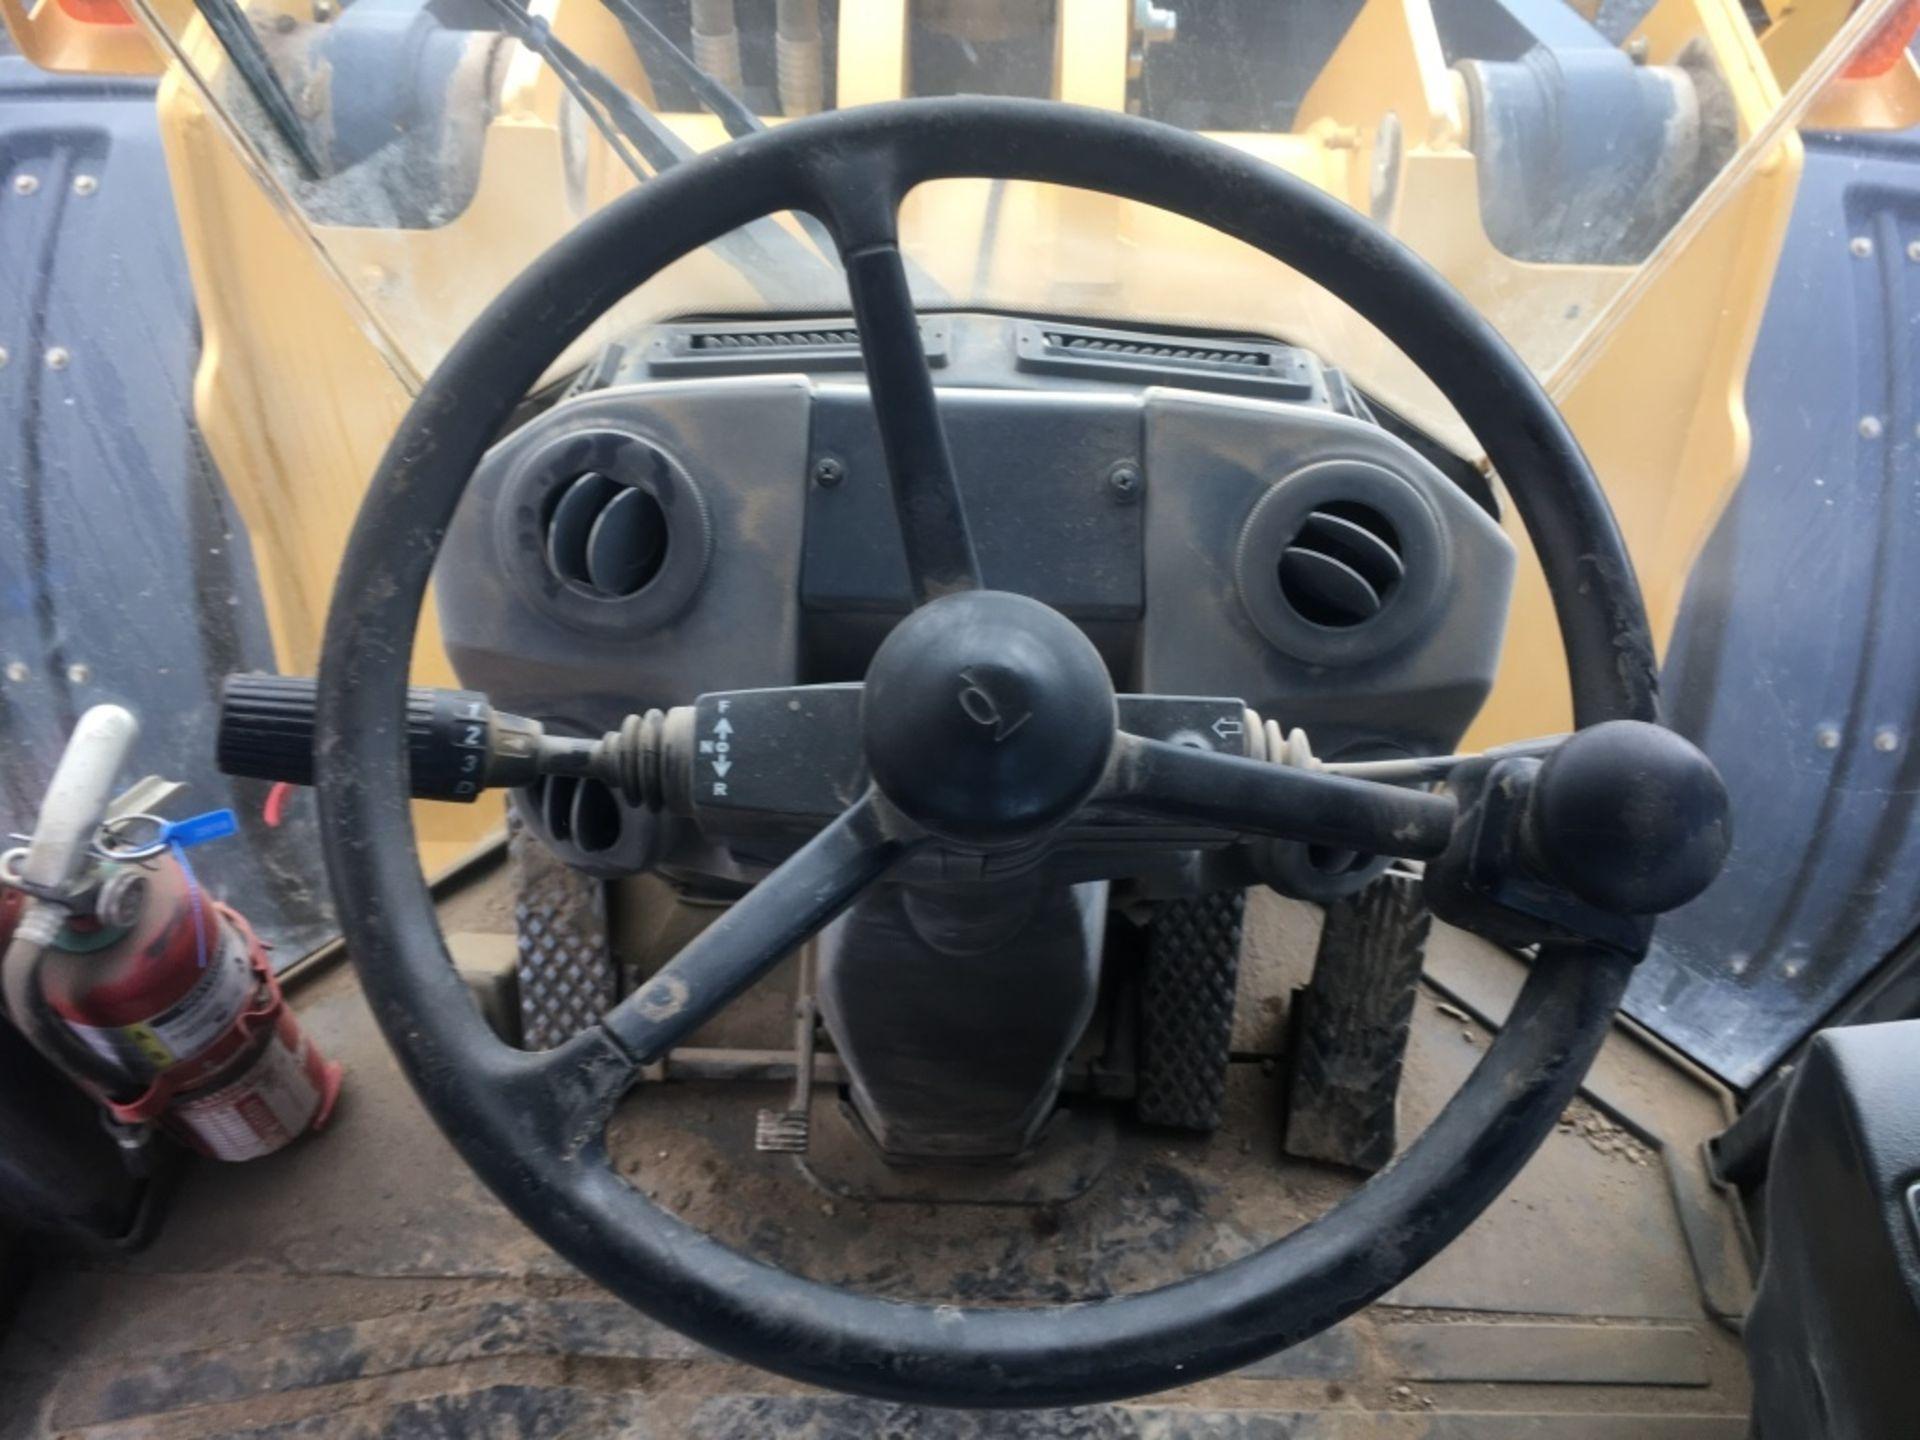 Lot 26 - 2012 John Deere 824K Wheel Loader